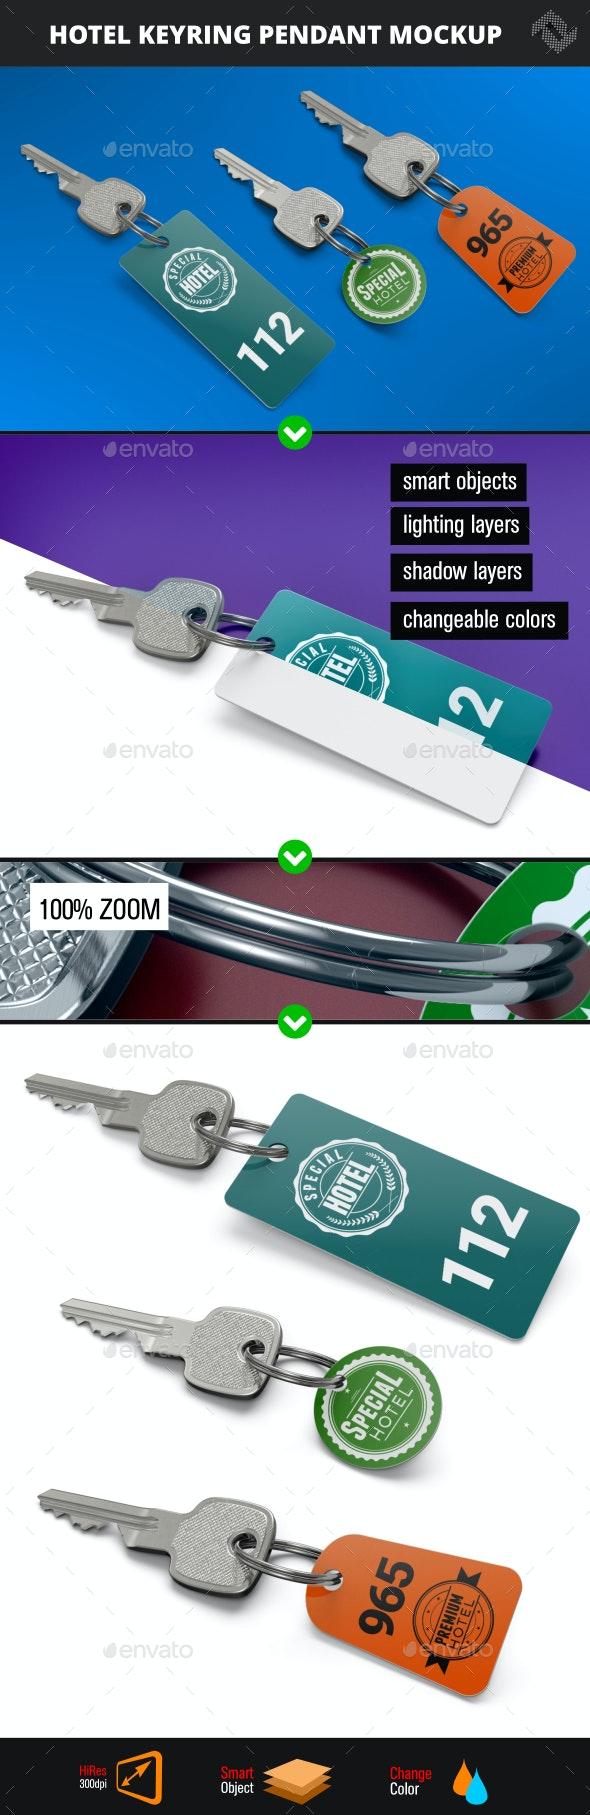 Hotel Keyring Pendant Mockup - Product Mock-Ups Graphics